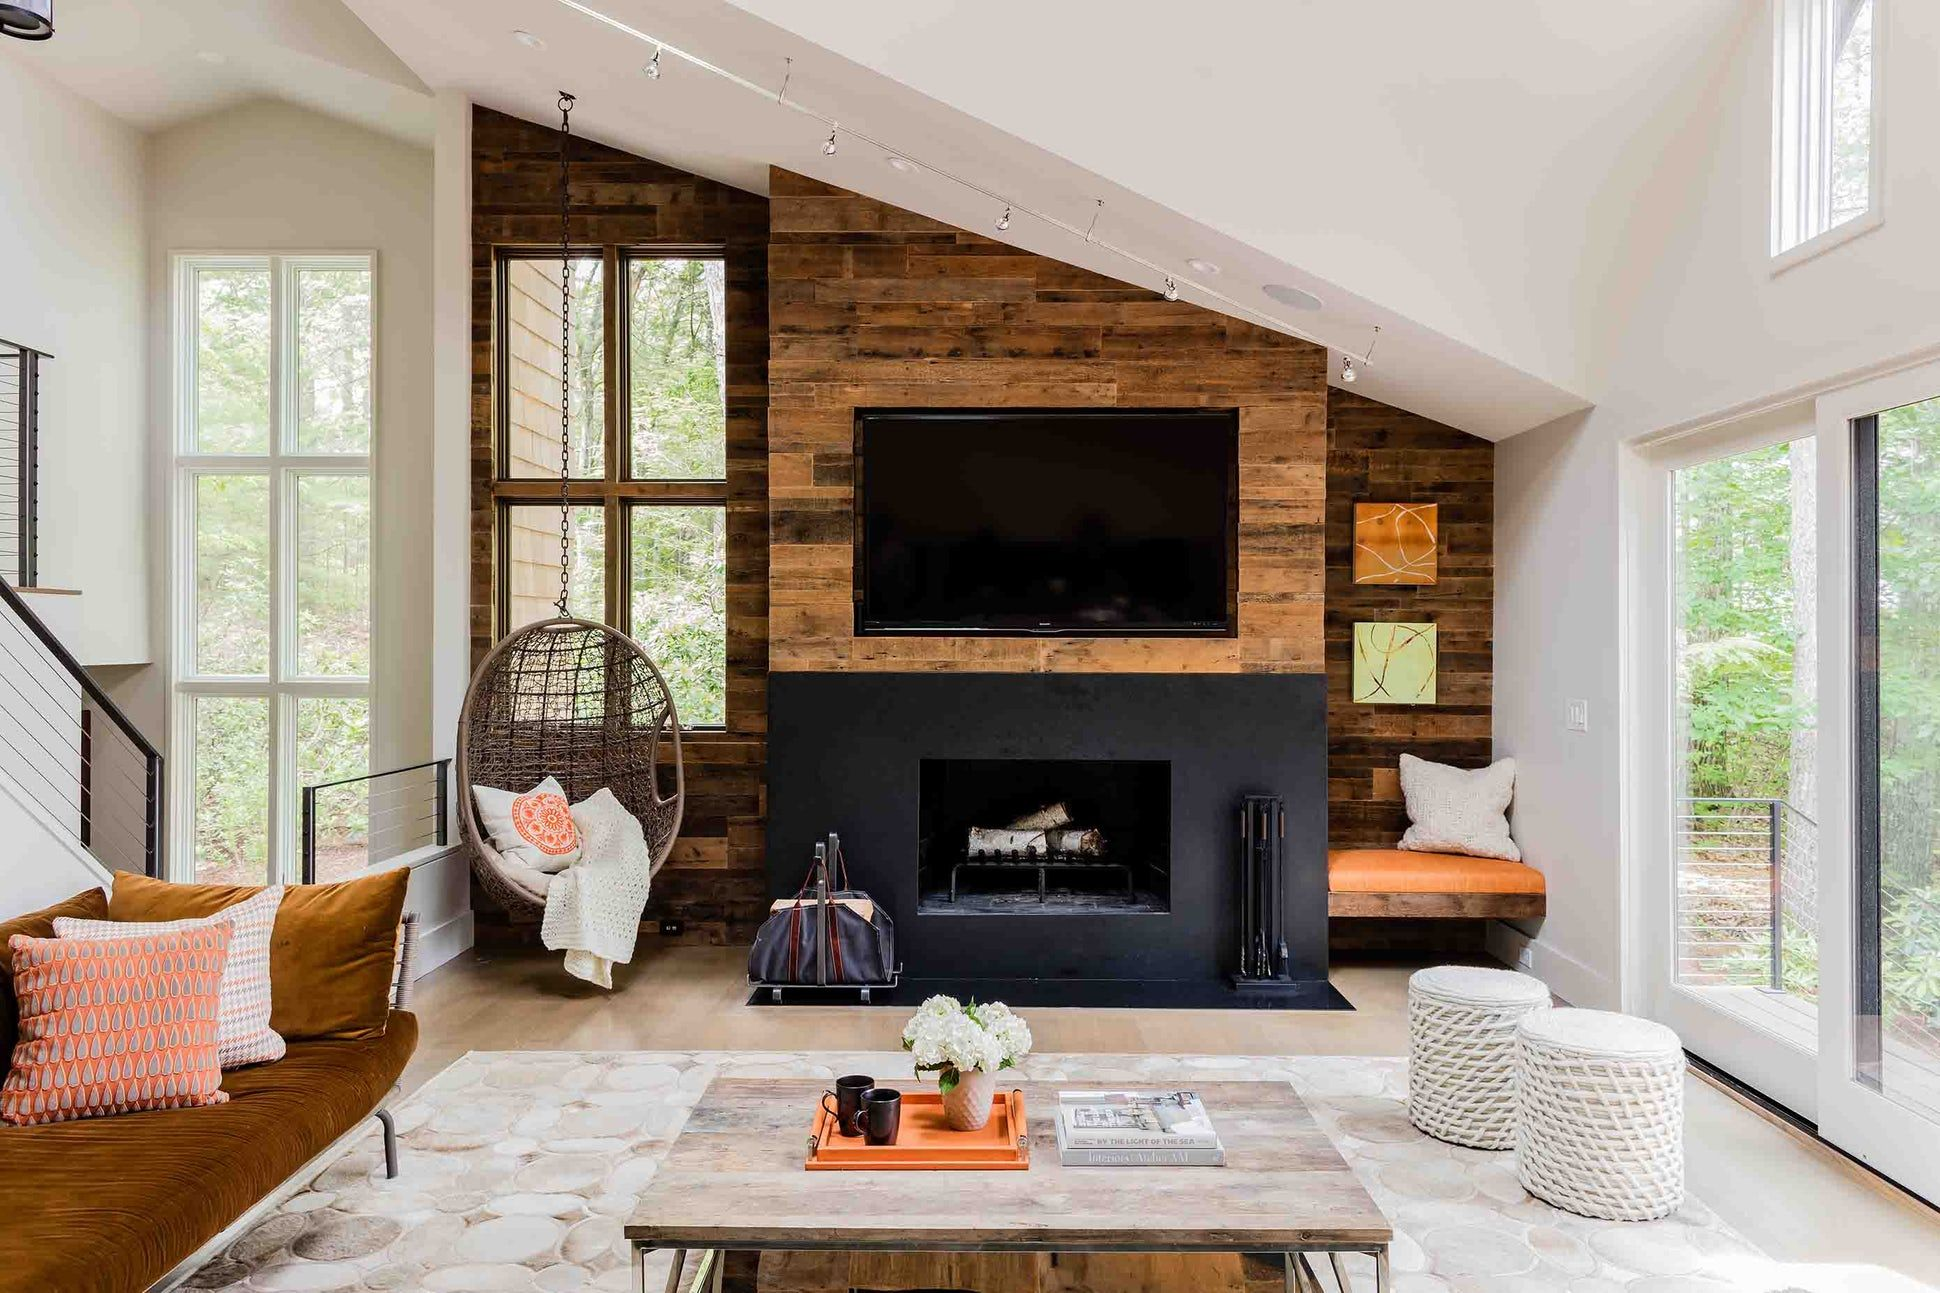 65 best fireplace ideas beautiful fireplace designs decor rh elledecor com wood stove fireplace ideas wood fireplace ideas modern